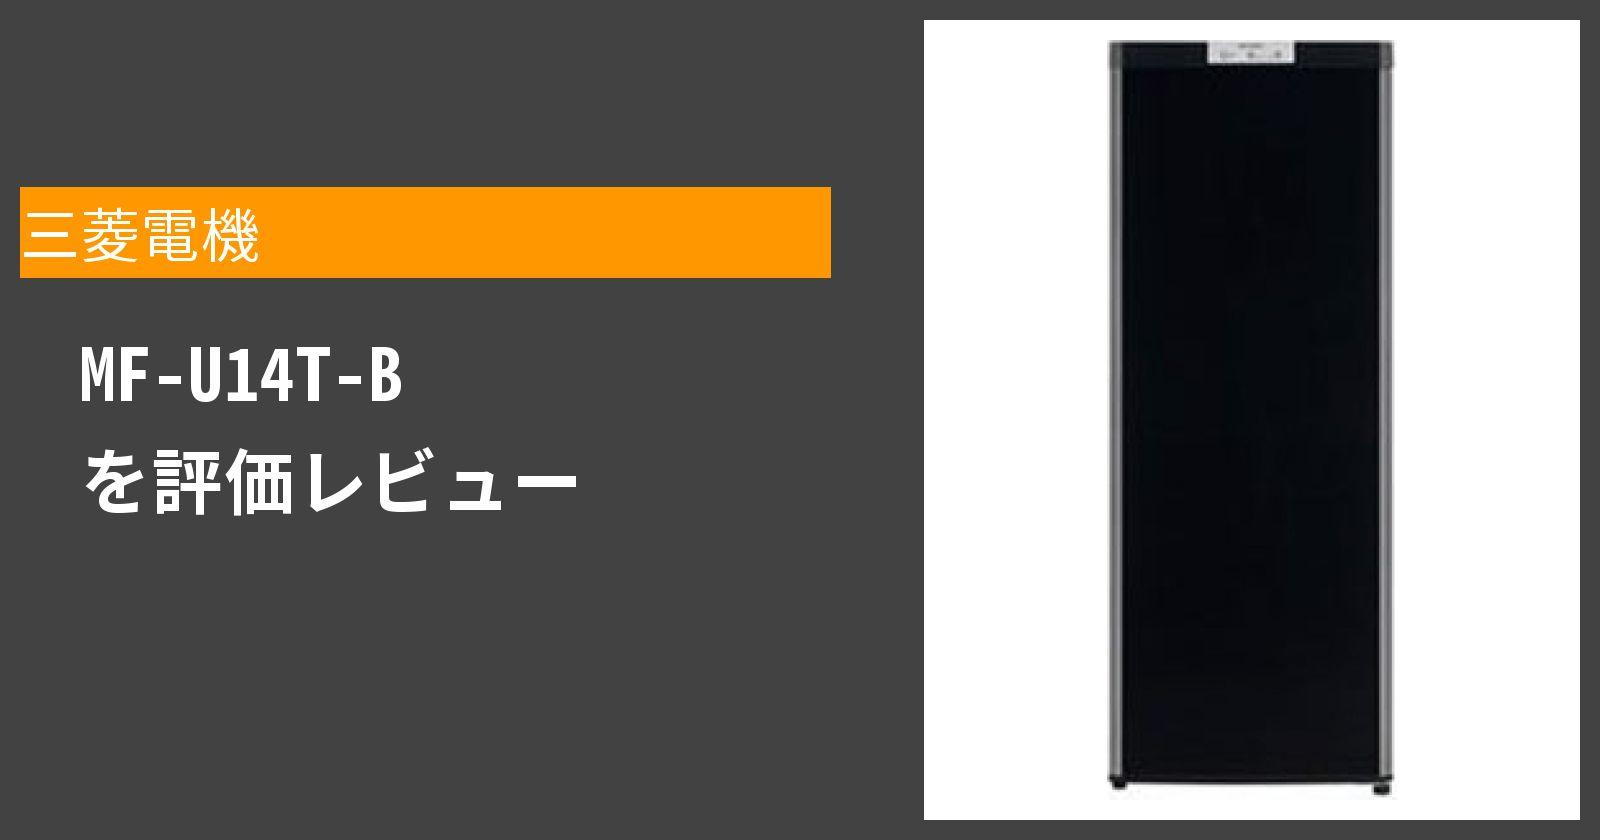 MF-U14T-Bを徹底評価